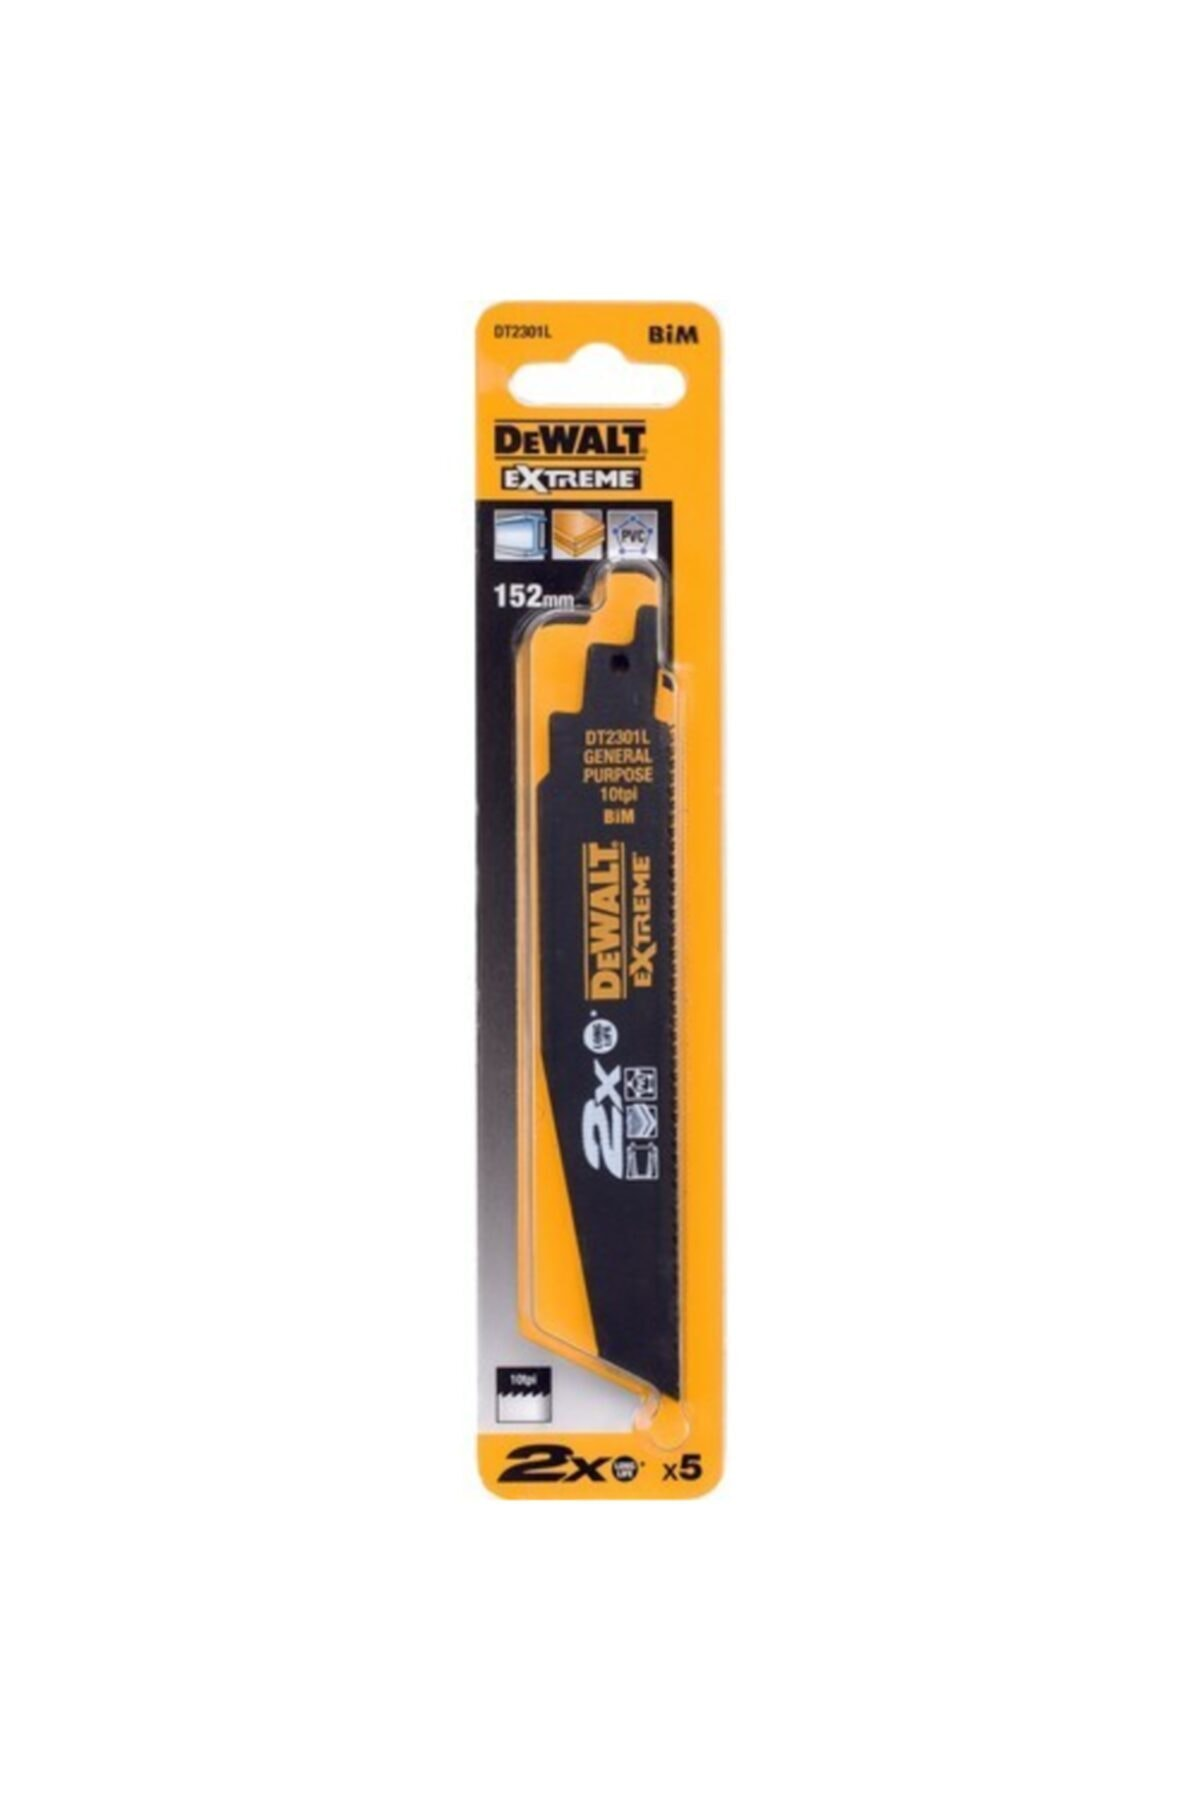 Dewalt Dt2301l Tilki Kuyruğu Testere Bıçağı Metal,plastik 5ad. 1